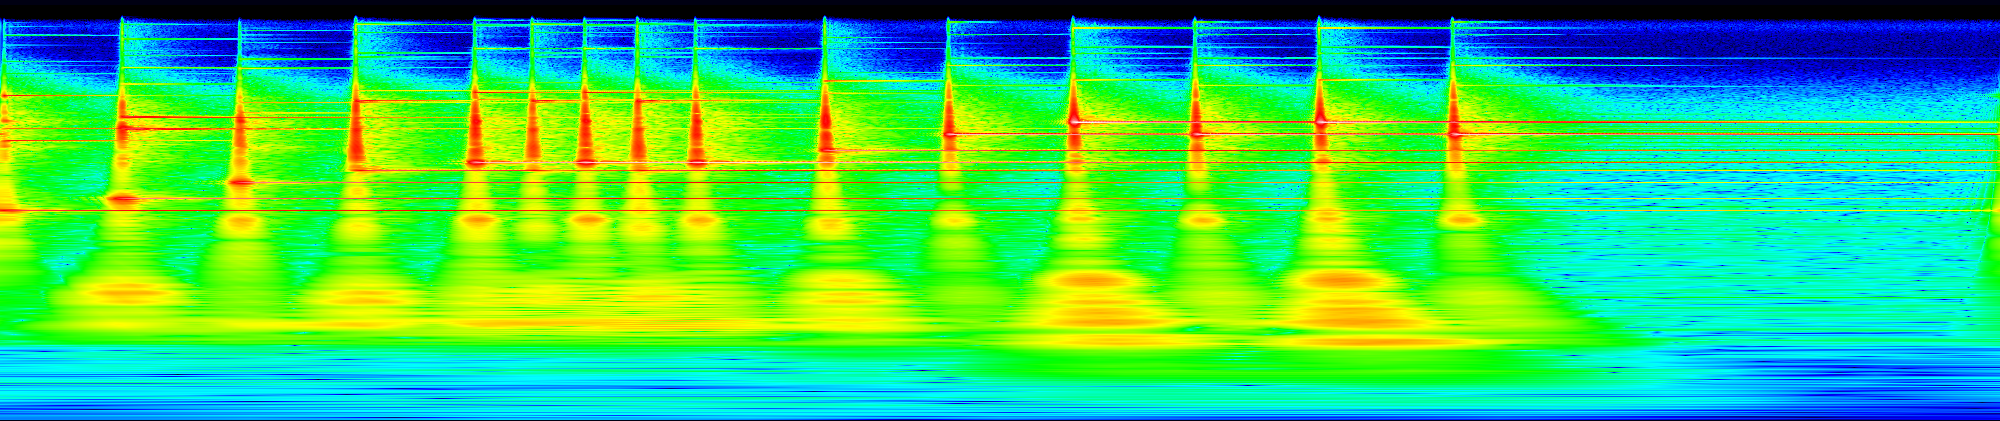 Glockenspiel spectrogram, phon scaled